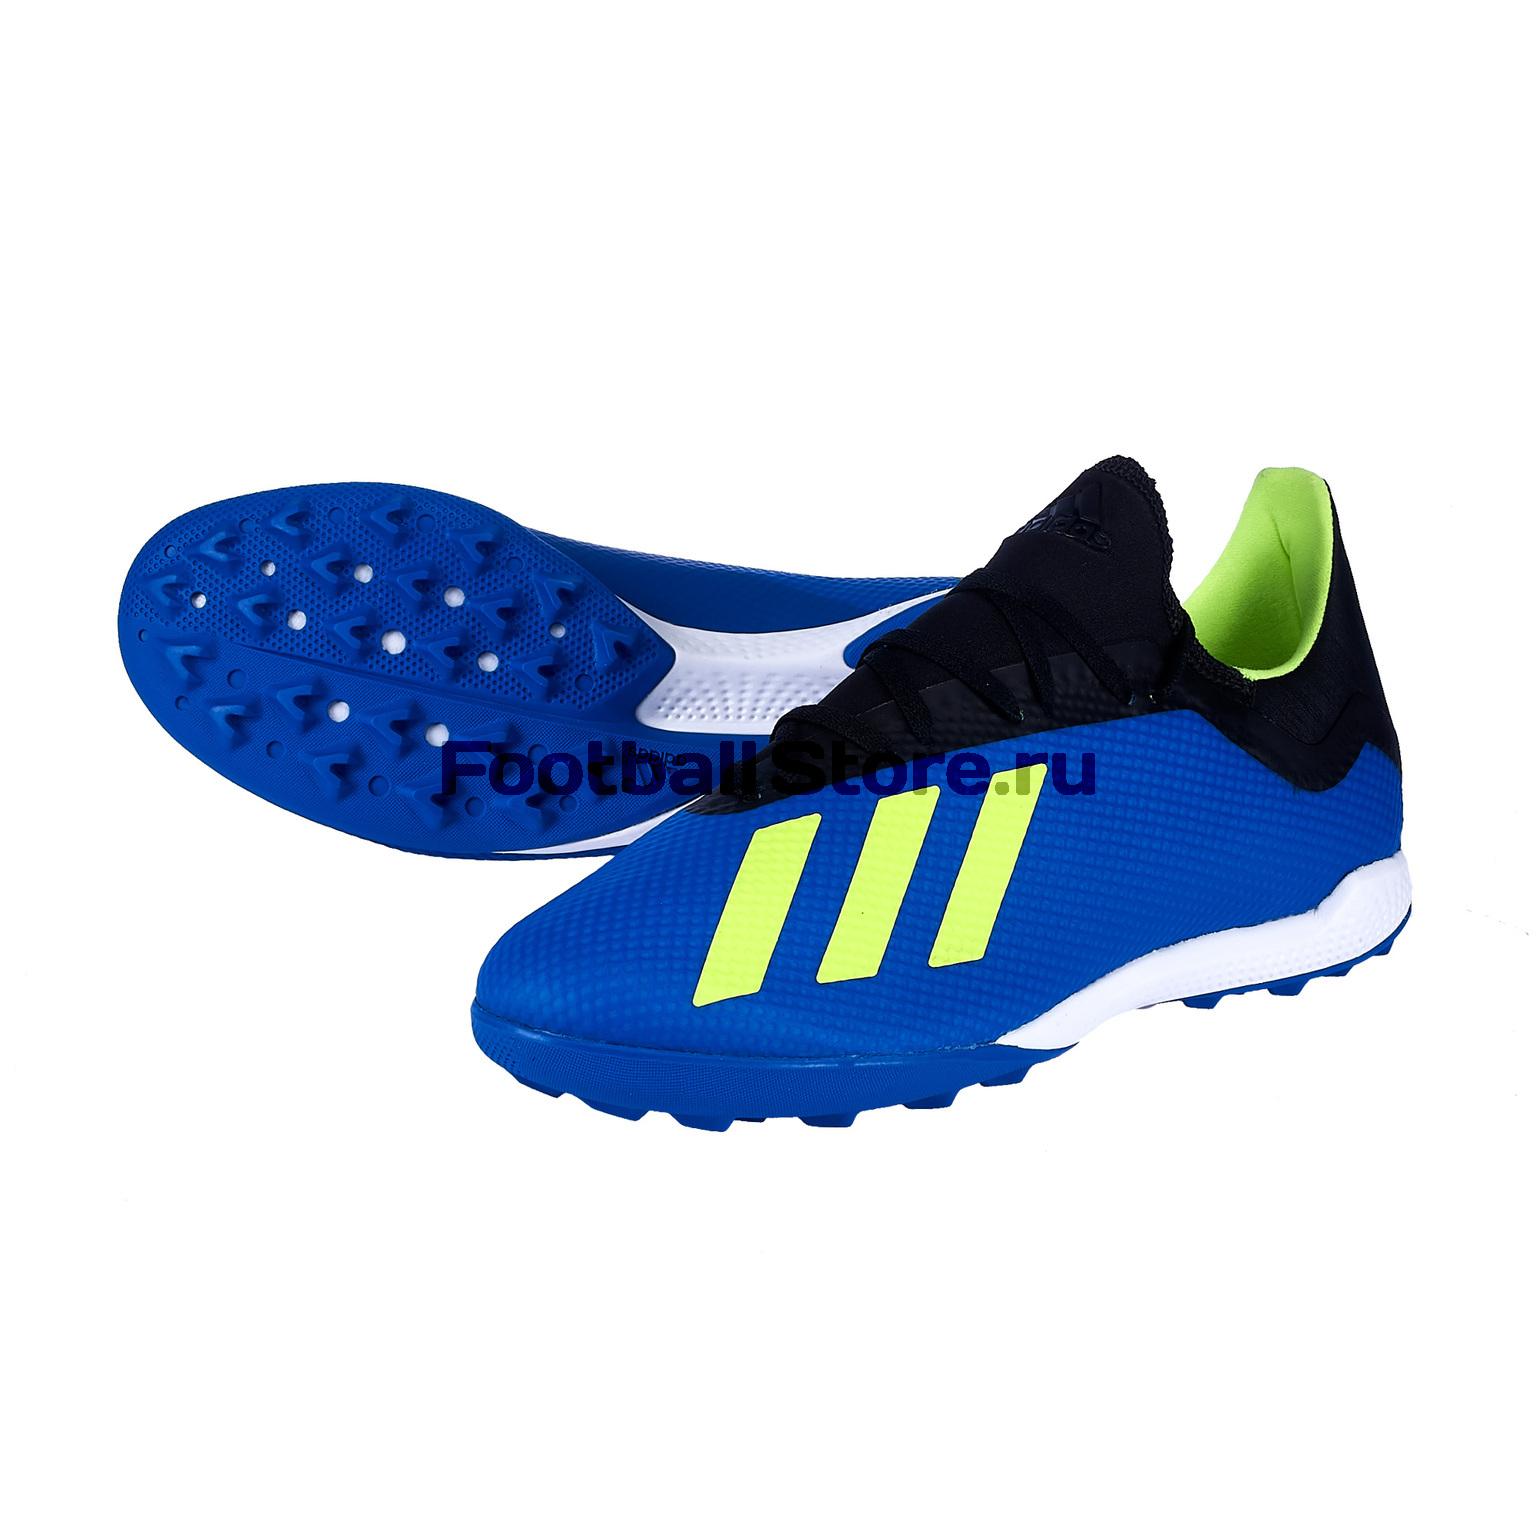 Шиповки Adidas X Tango 18.3 TF DB1955 234w ijoy captain pd270 tc box mod